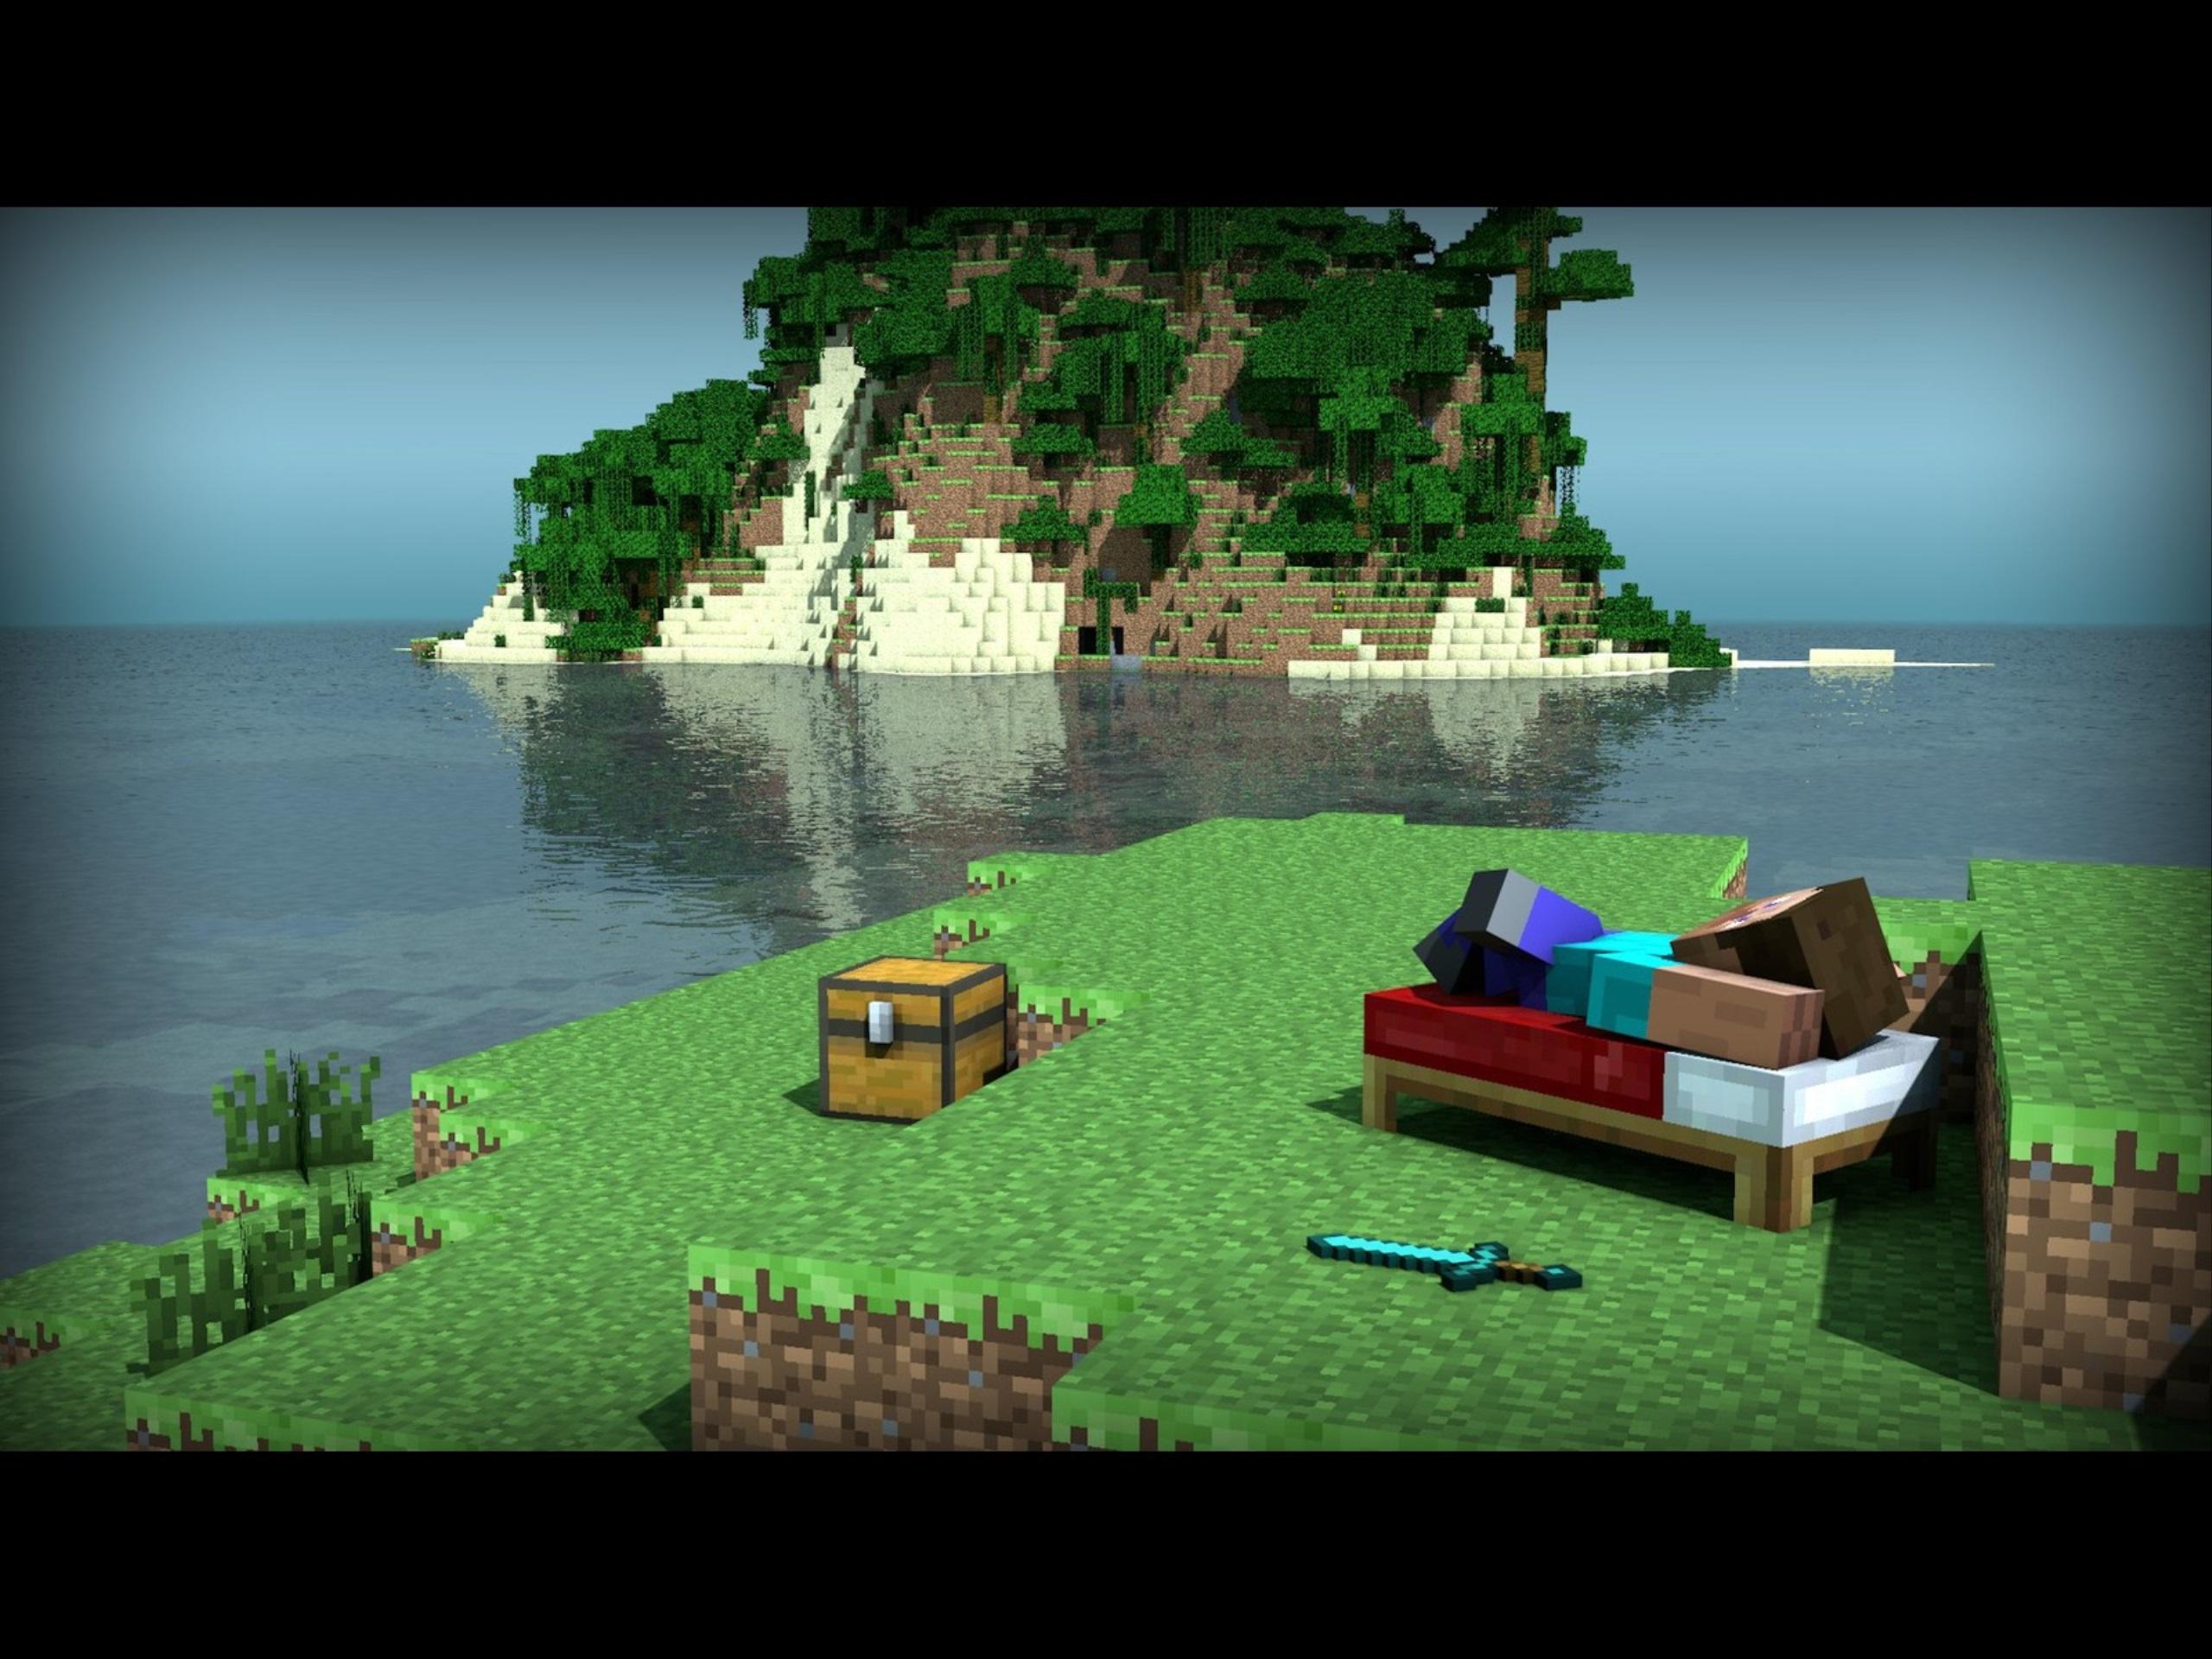 http://fileframe.sector.sk/files/wallpaper/minecraft-/wallpaper-minecraft-pixelated-vacation-6.jpg